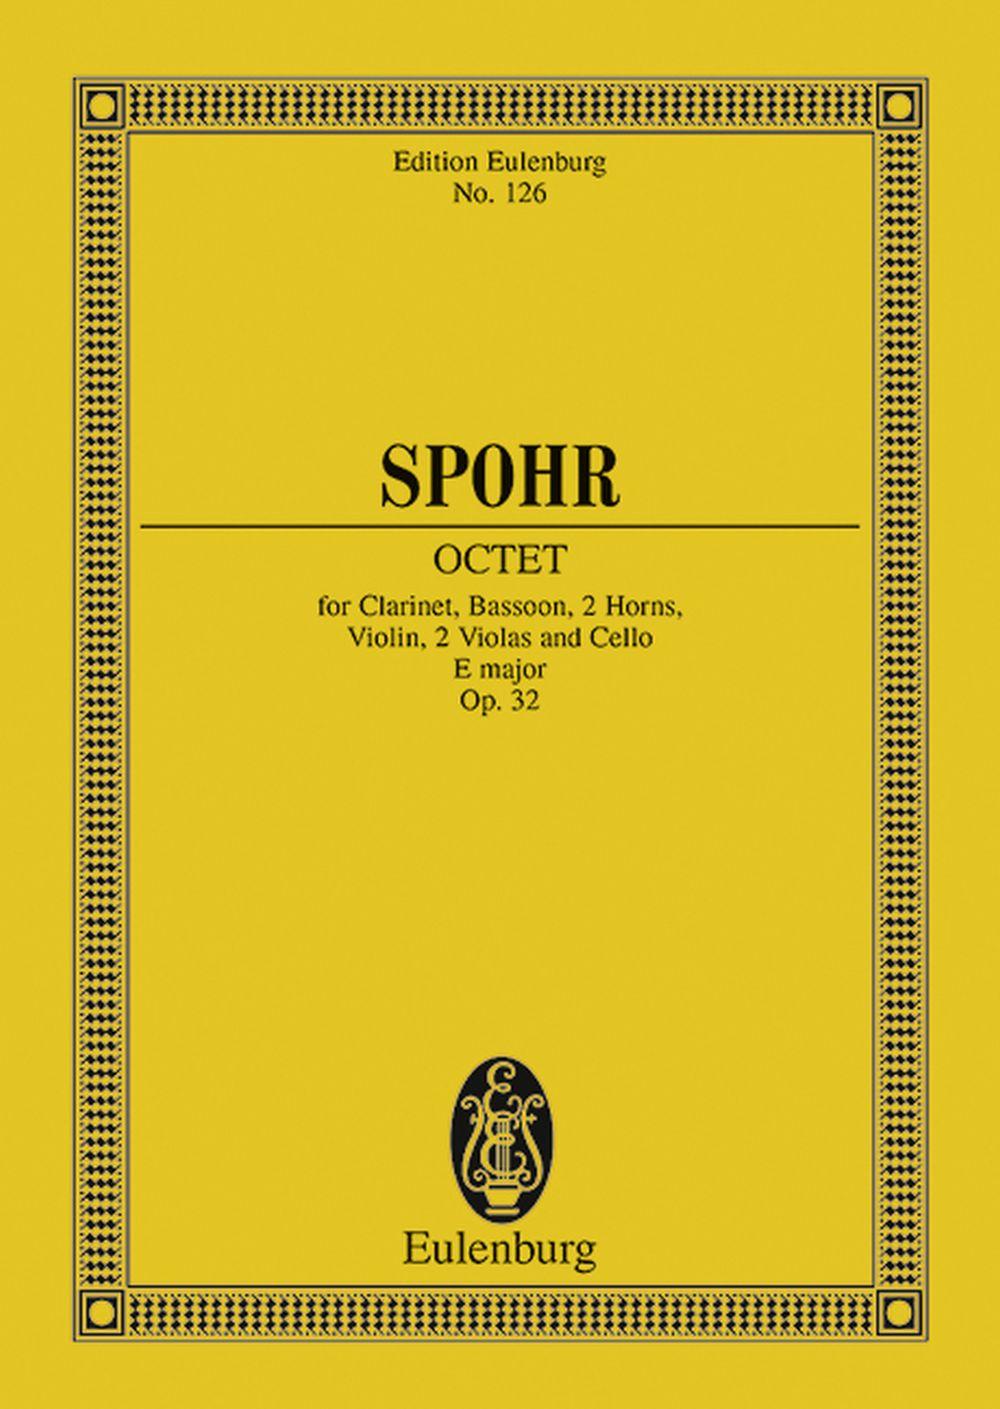 Louis Spohr: Octet E major op. 32: Chamber Ensemble: Miniature Score